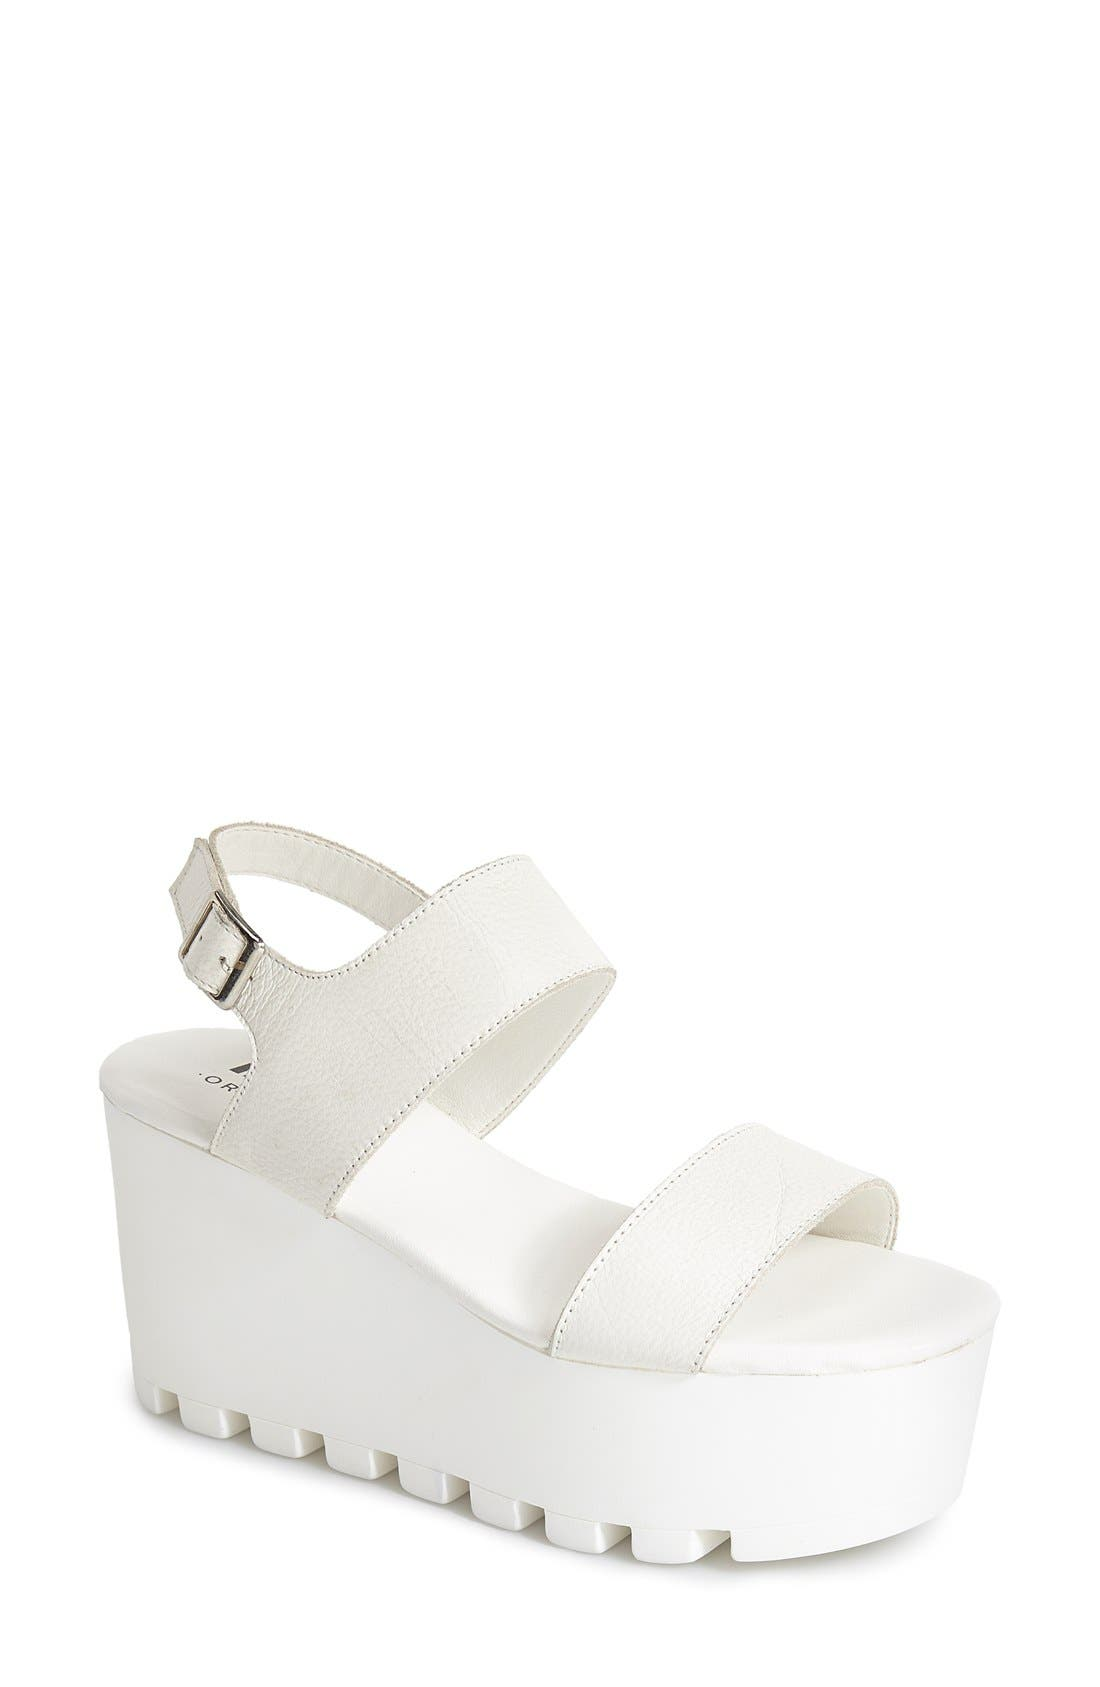 Main Image - MTNG Originals 'Amber' Platform Sandal (Women)